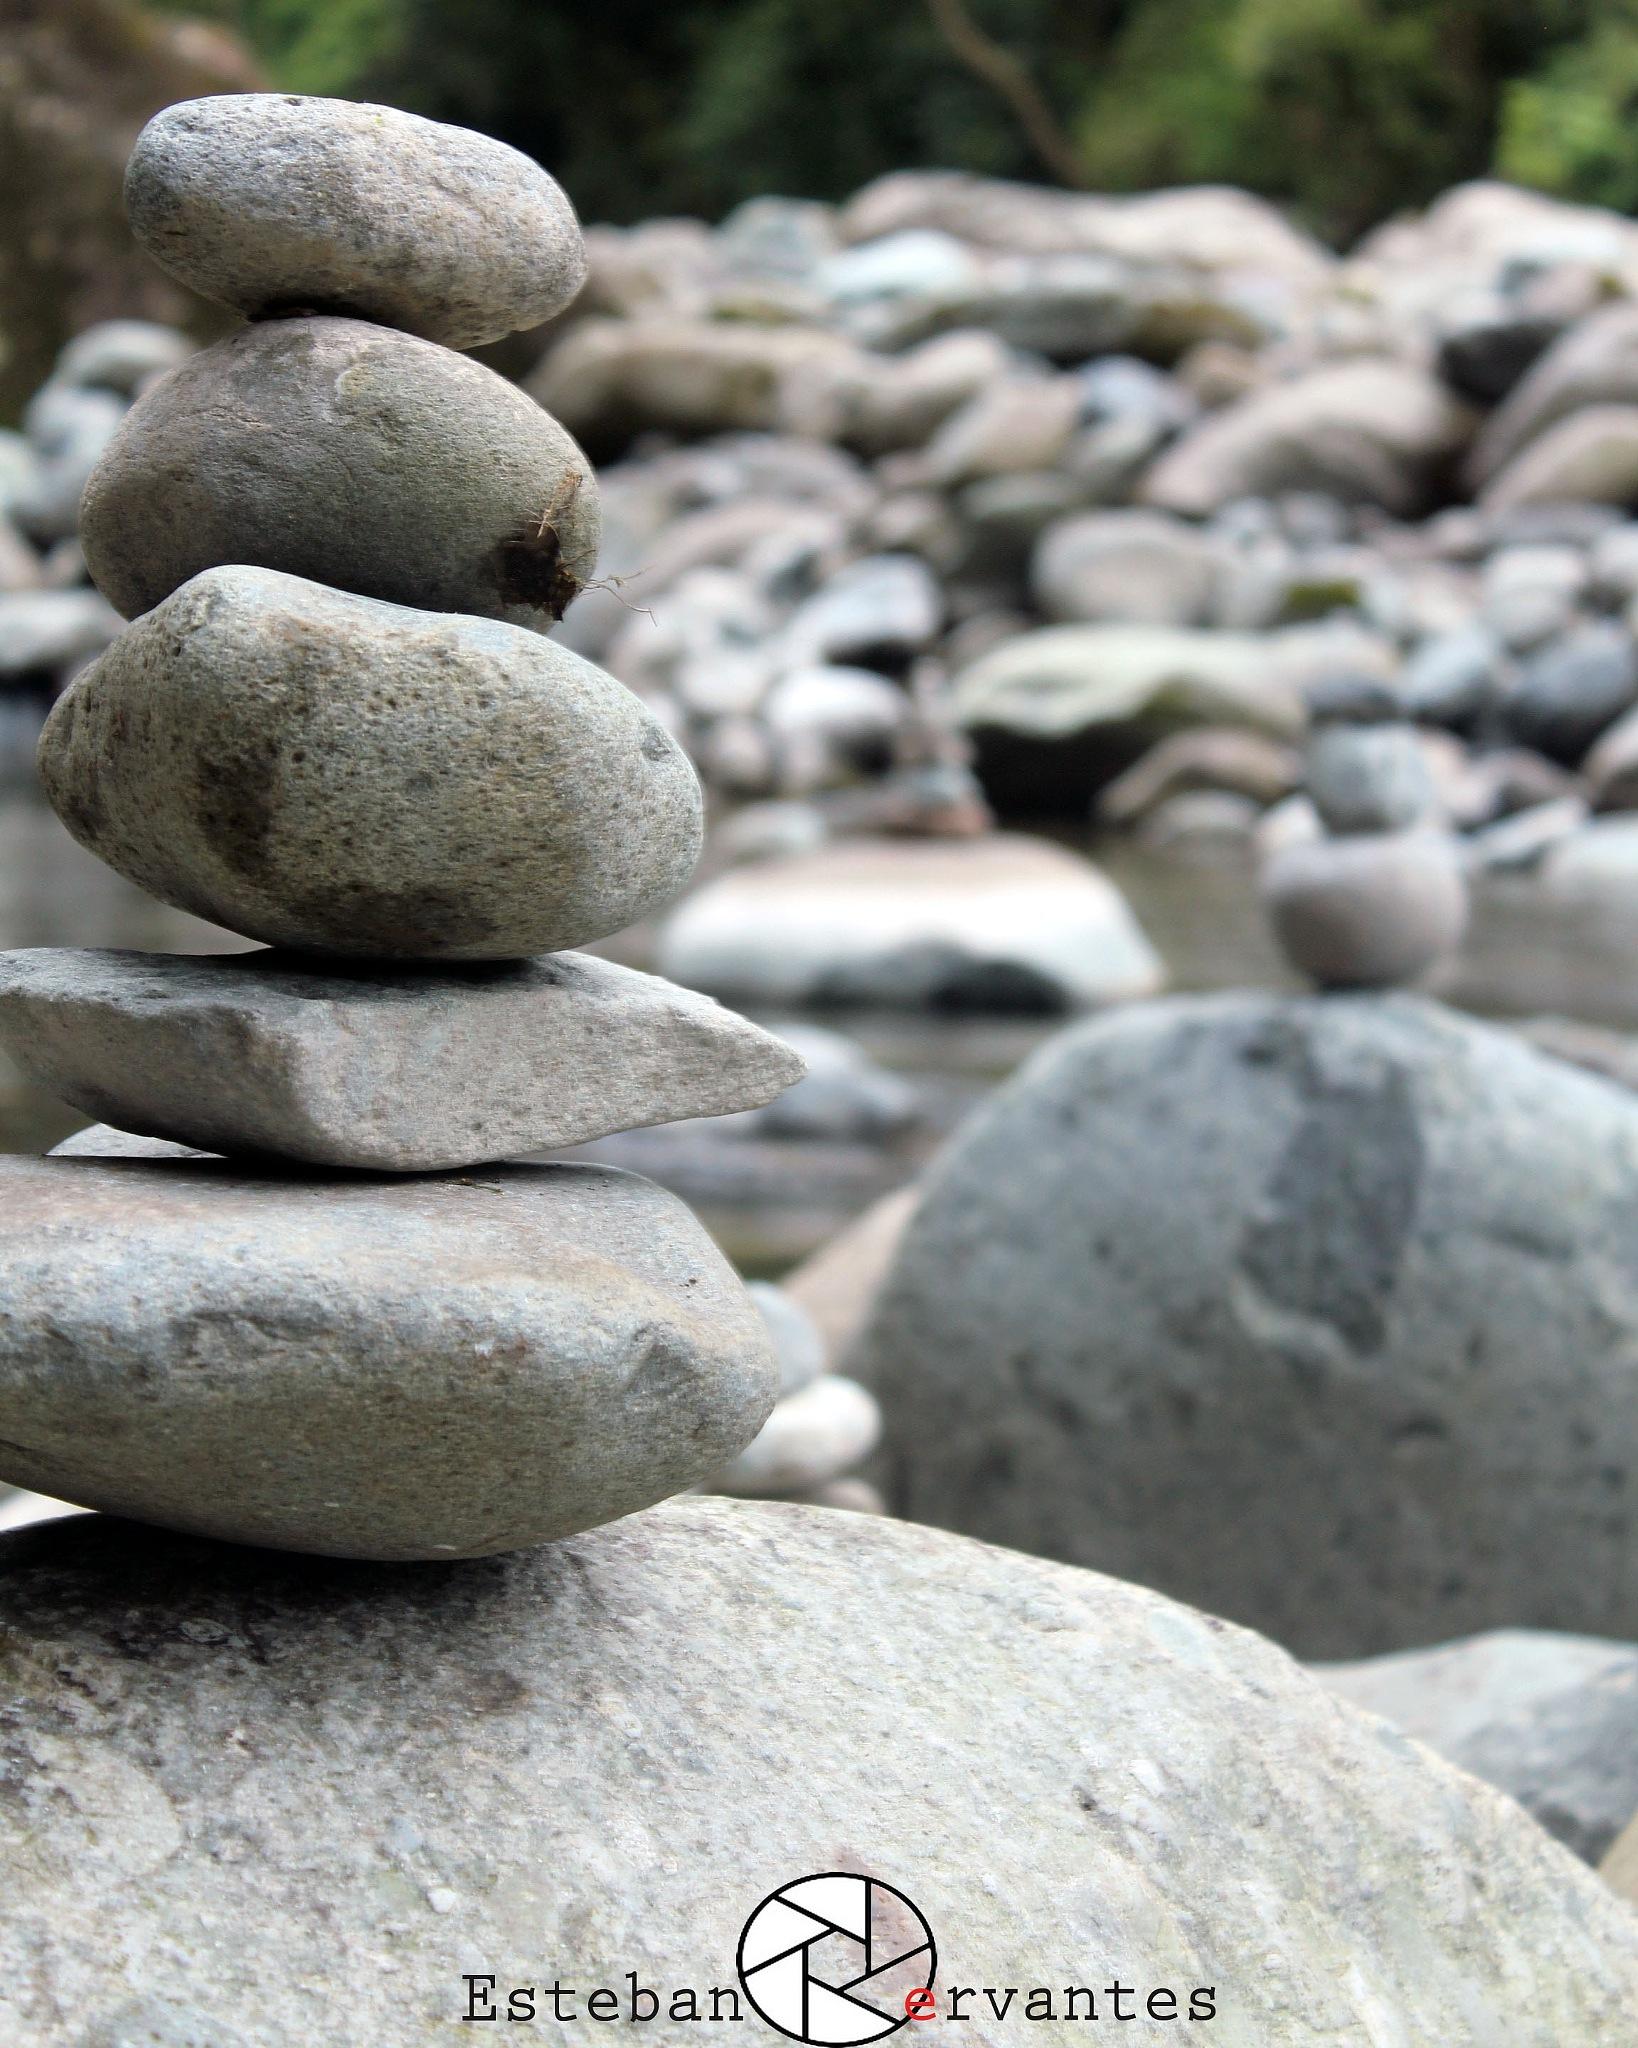 Equilibrio by Esteban Cervantes